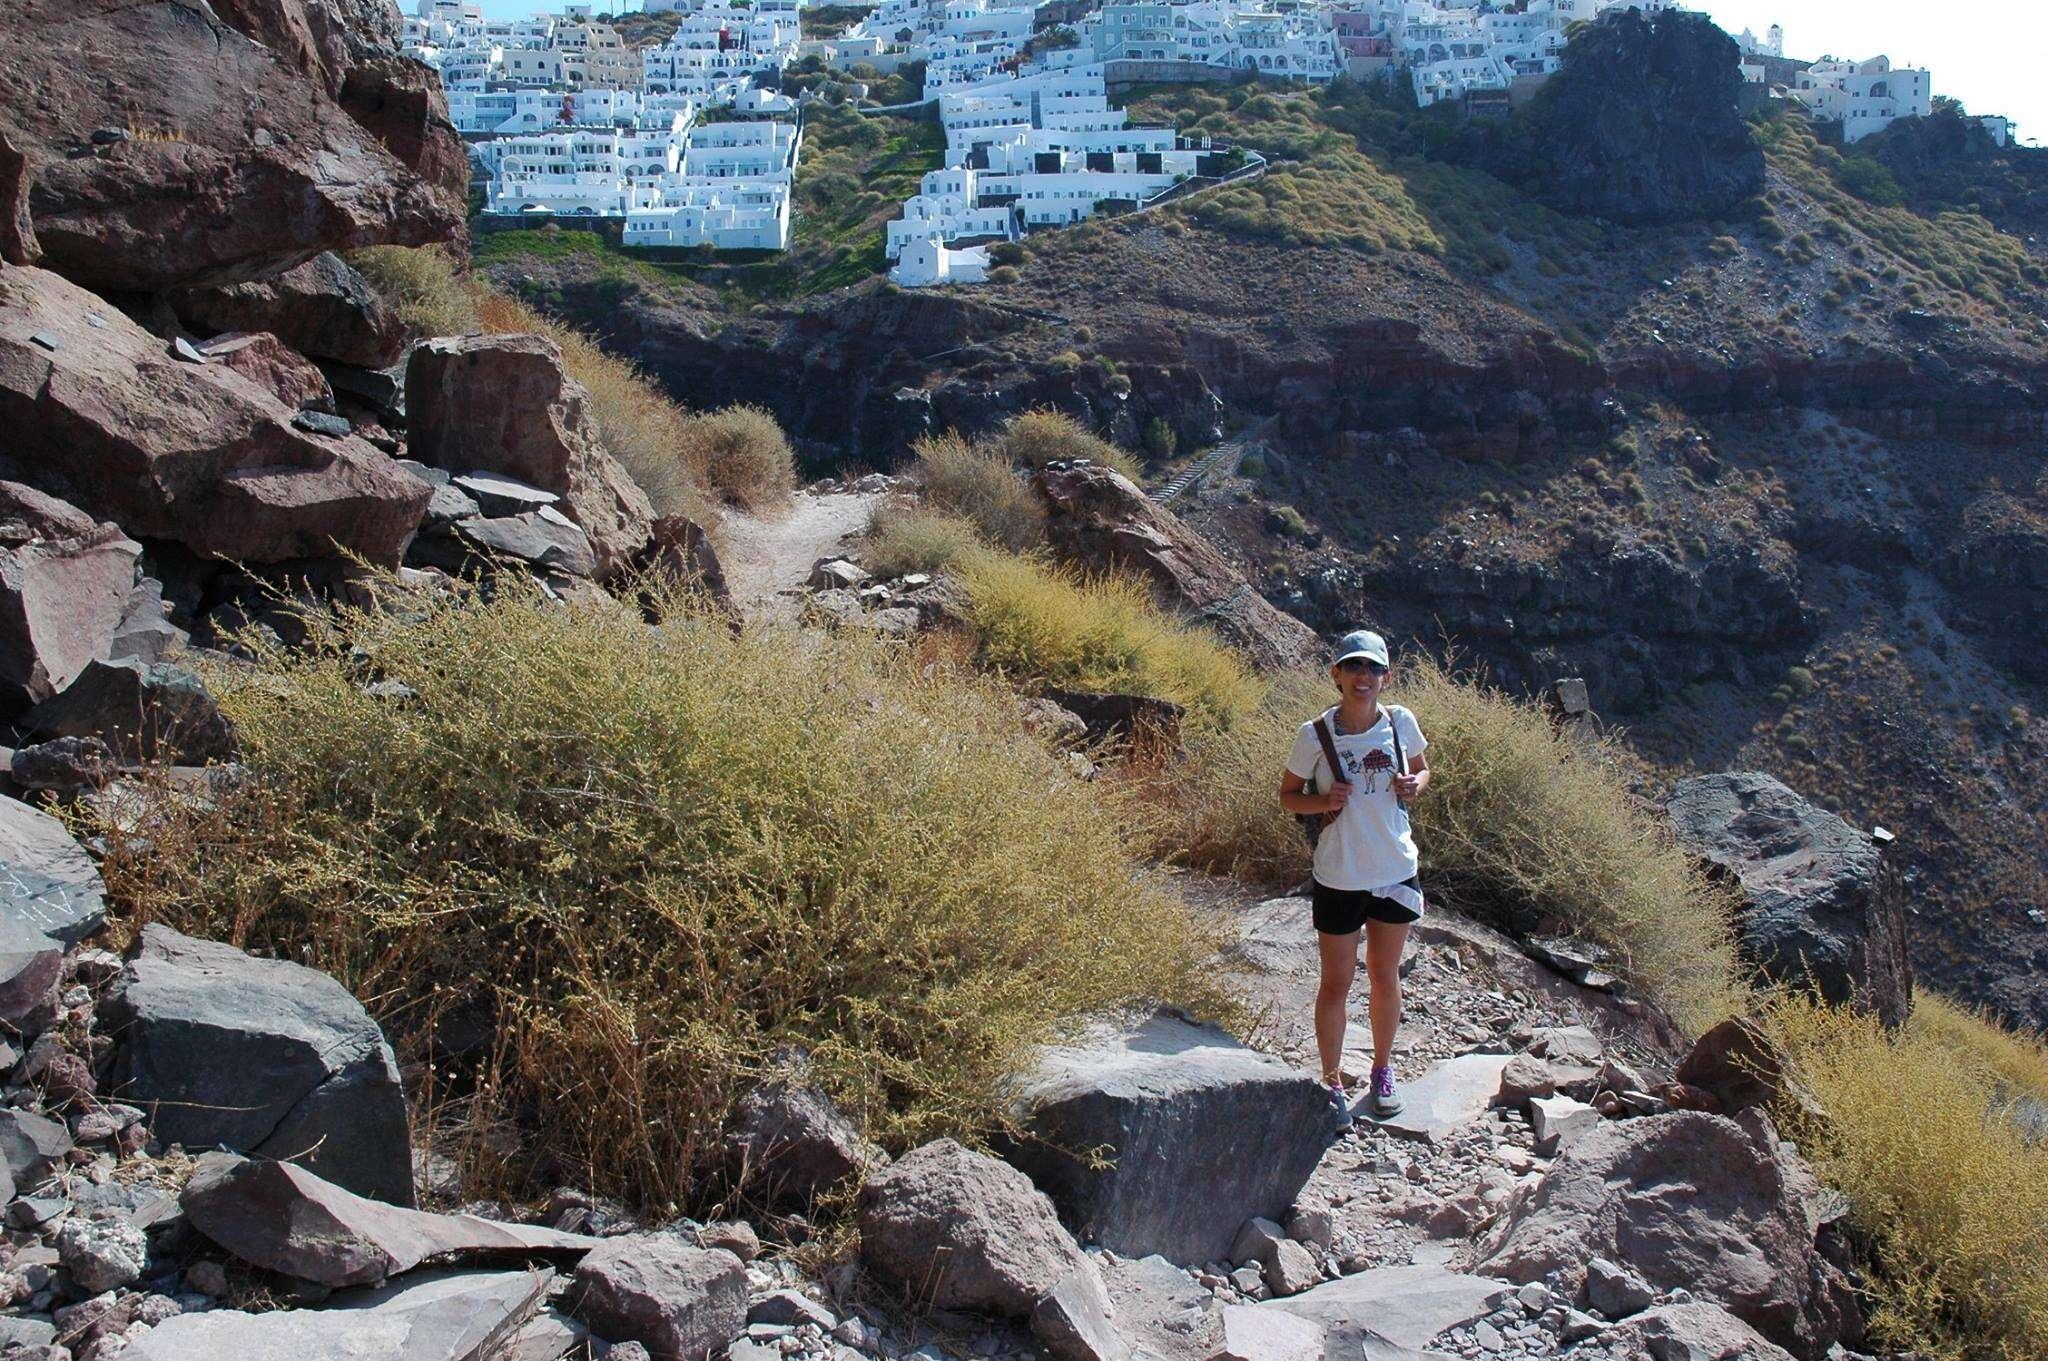 Hiking up Skaros Rock in Imerovigli, Santorini